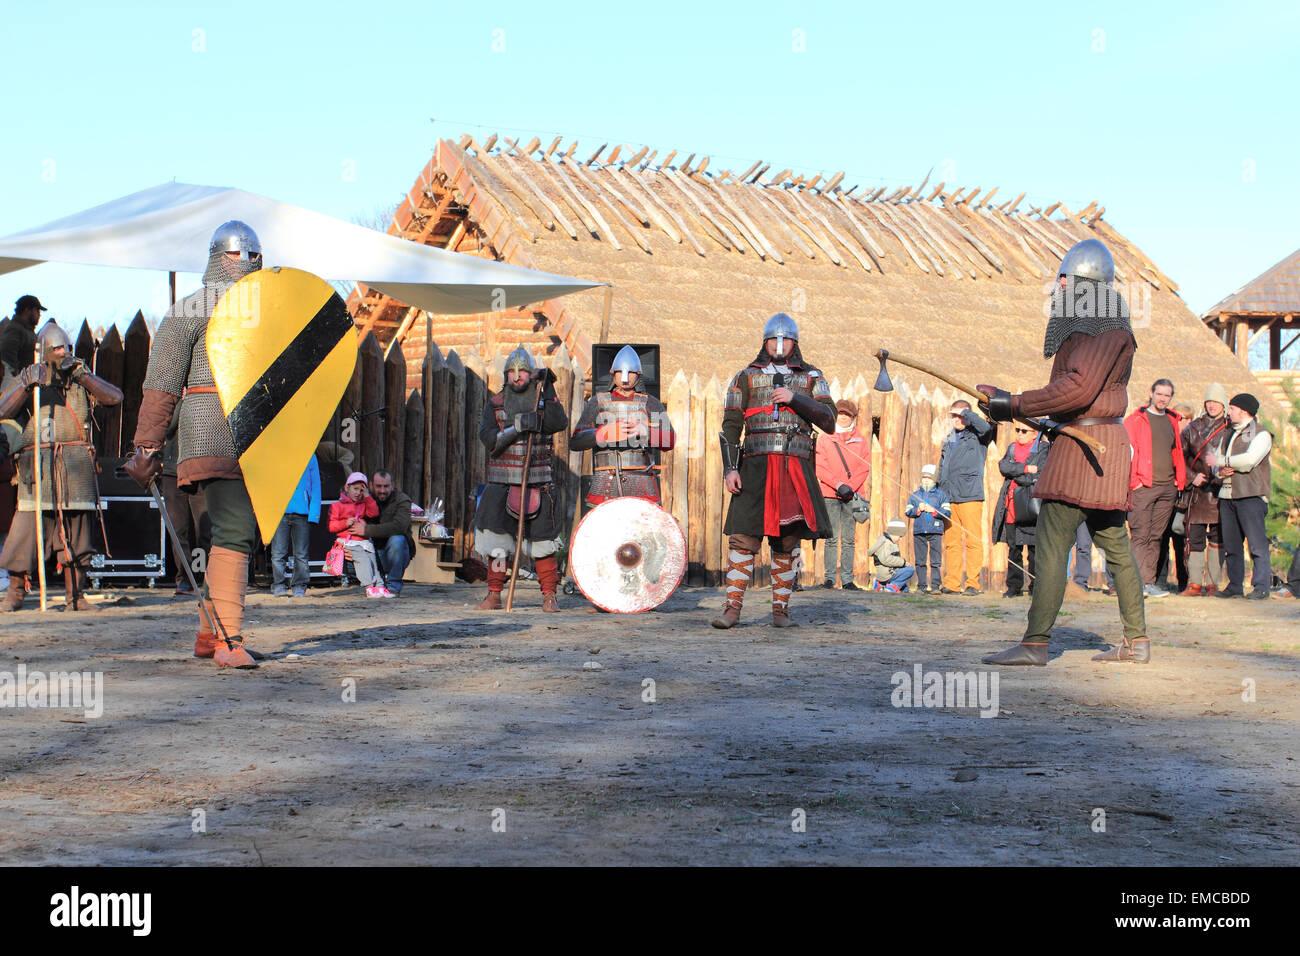 Warriors in medieval costumes in acting battle. Slawutowo village, Pomerania region, Poland - Stock Image